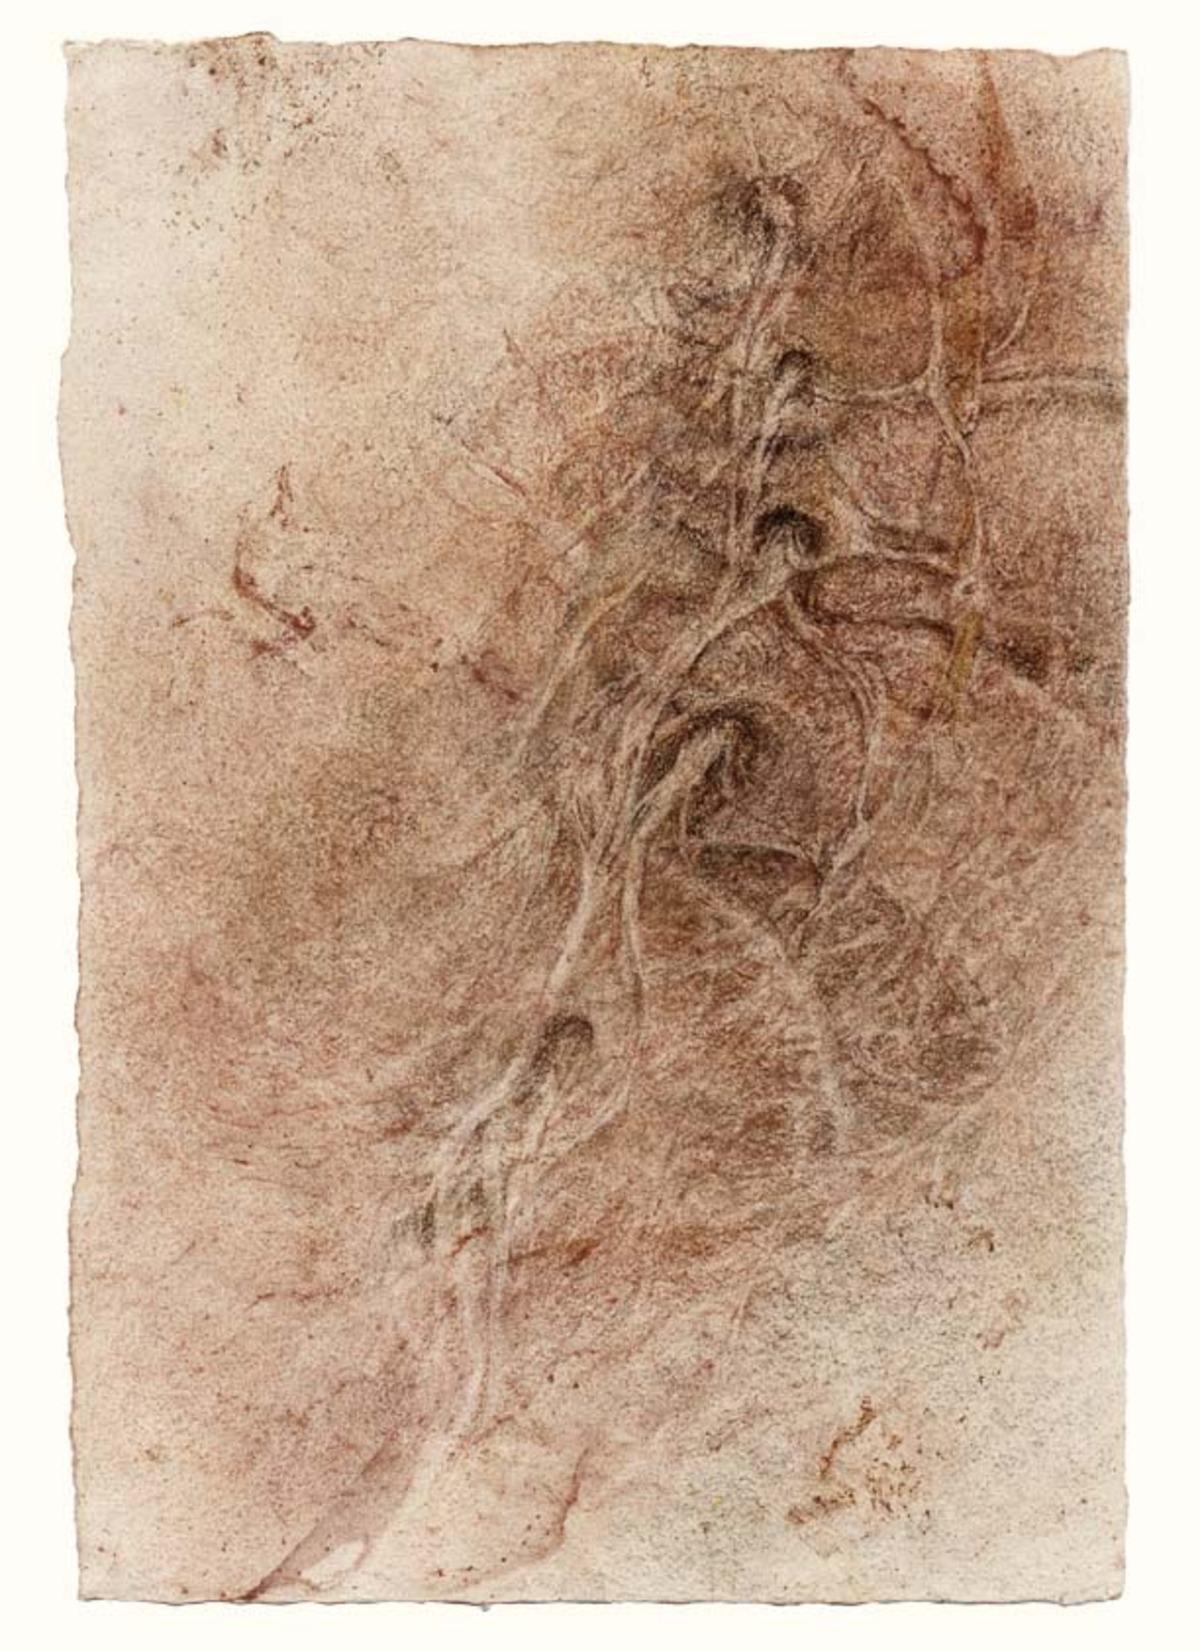 Lumbar vertebrae (L3-4-5) with emerging nerves ,    11 x 7.5 in.     $3,200